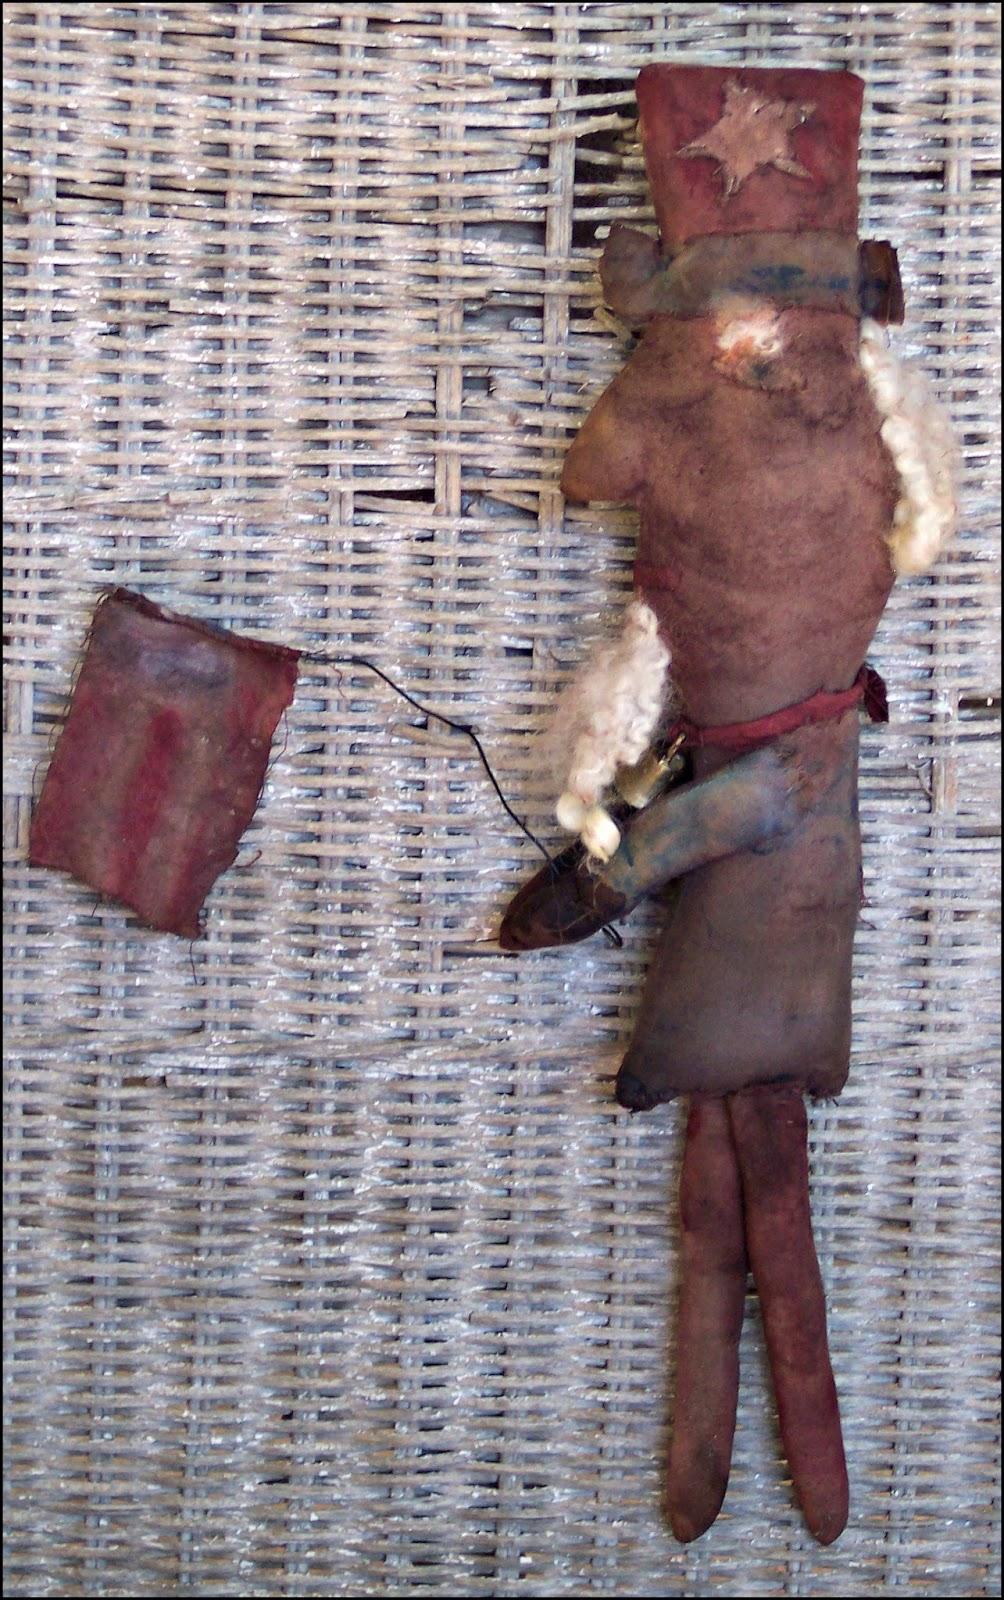 https://www.etsy.com/listing/192553225/primitive-americana-uncle-sam-doll